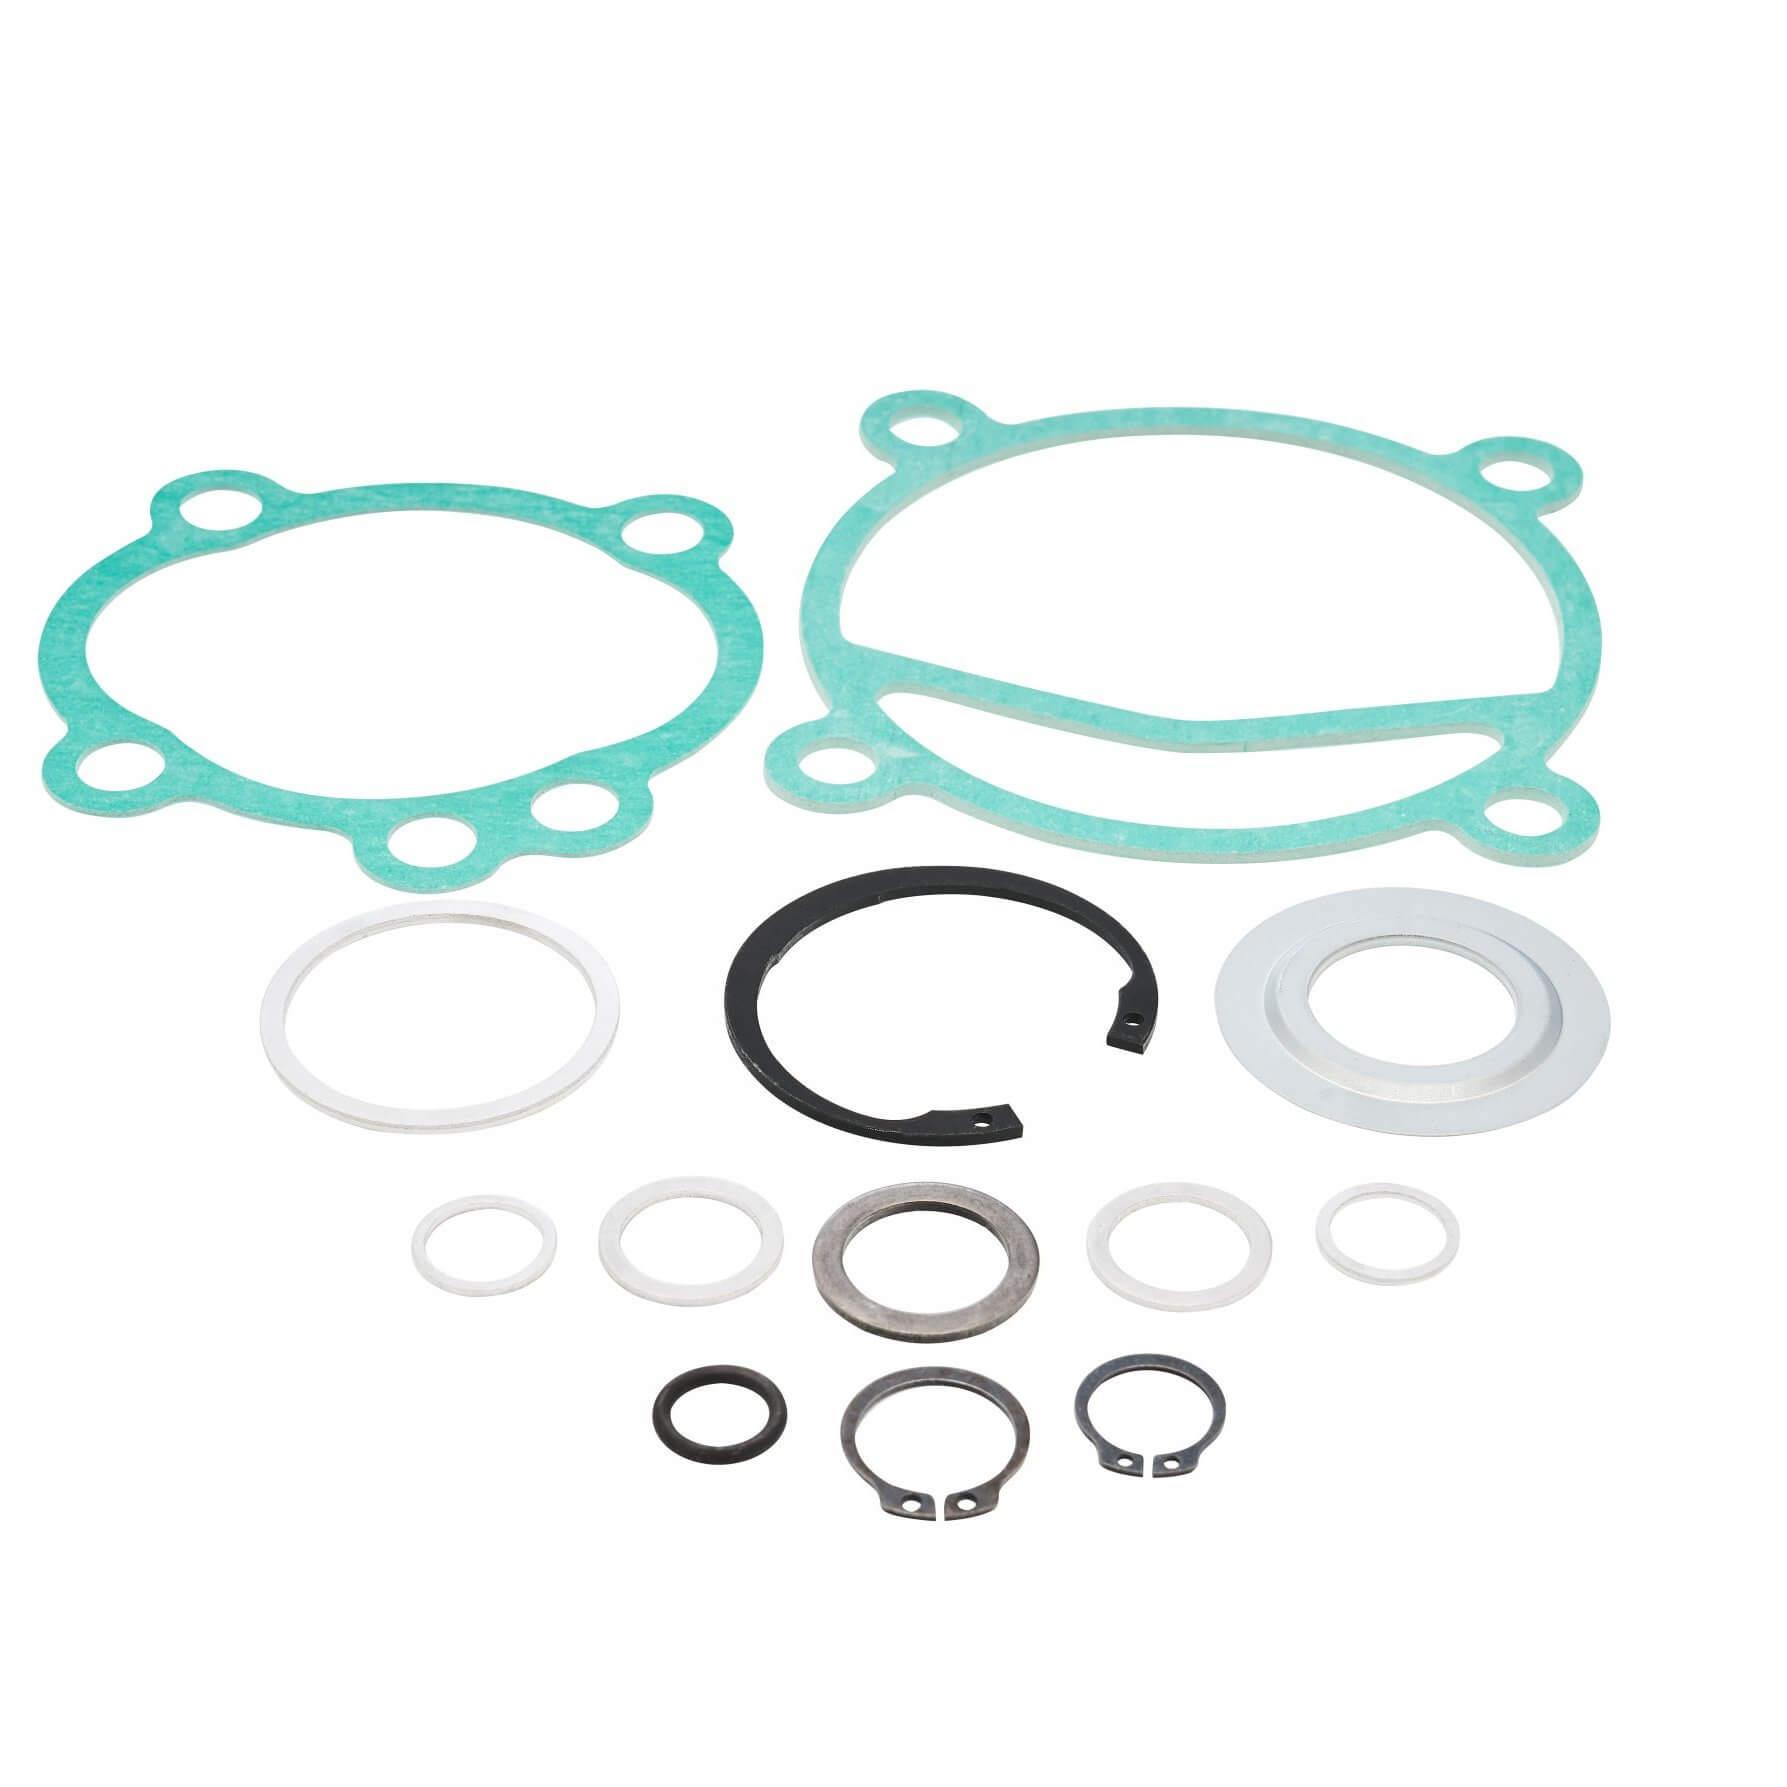 Pumps - Joint spare parts kit